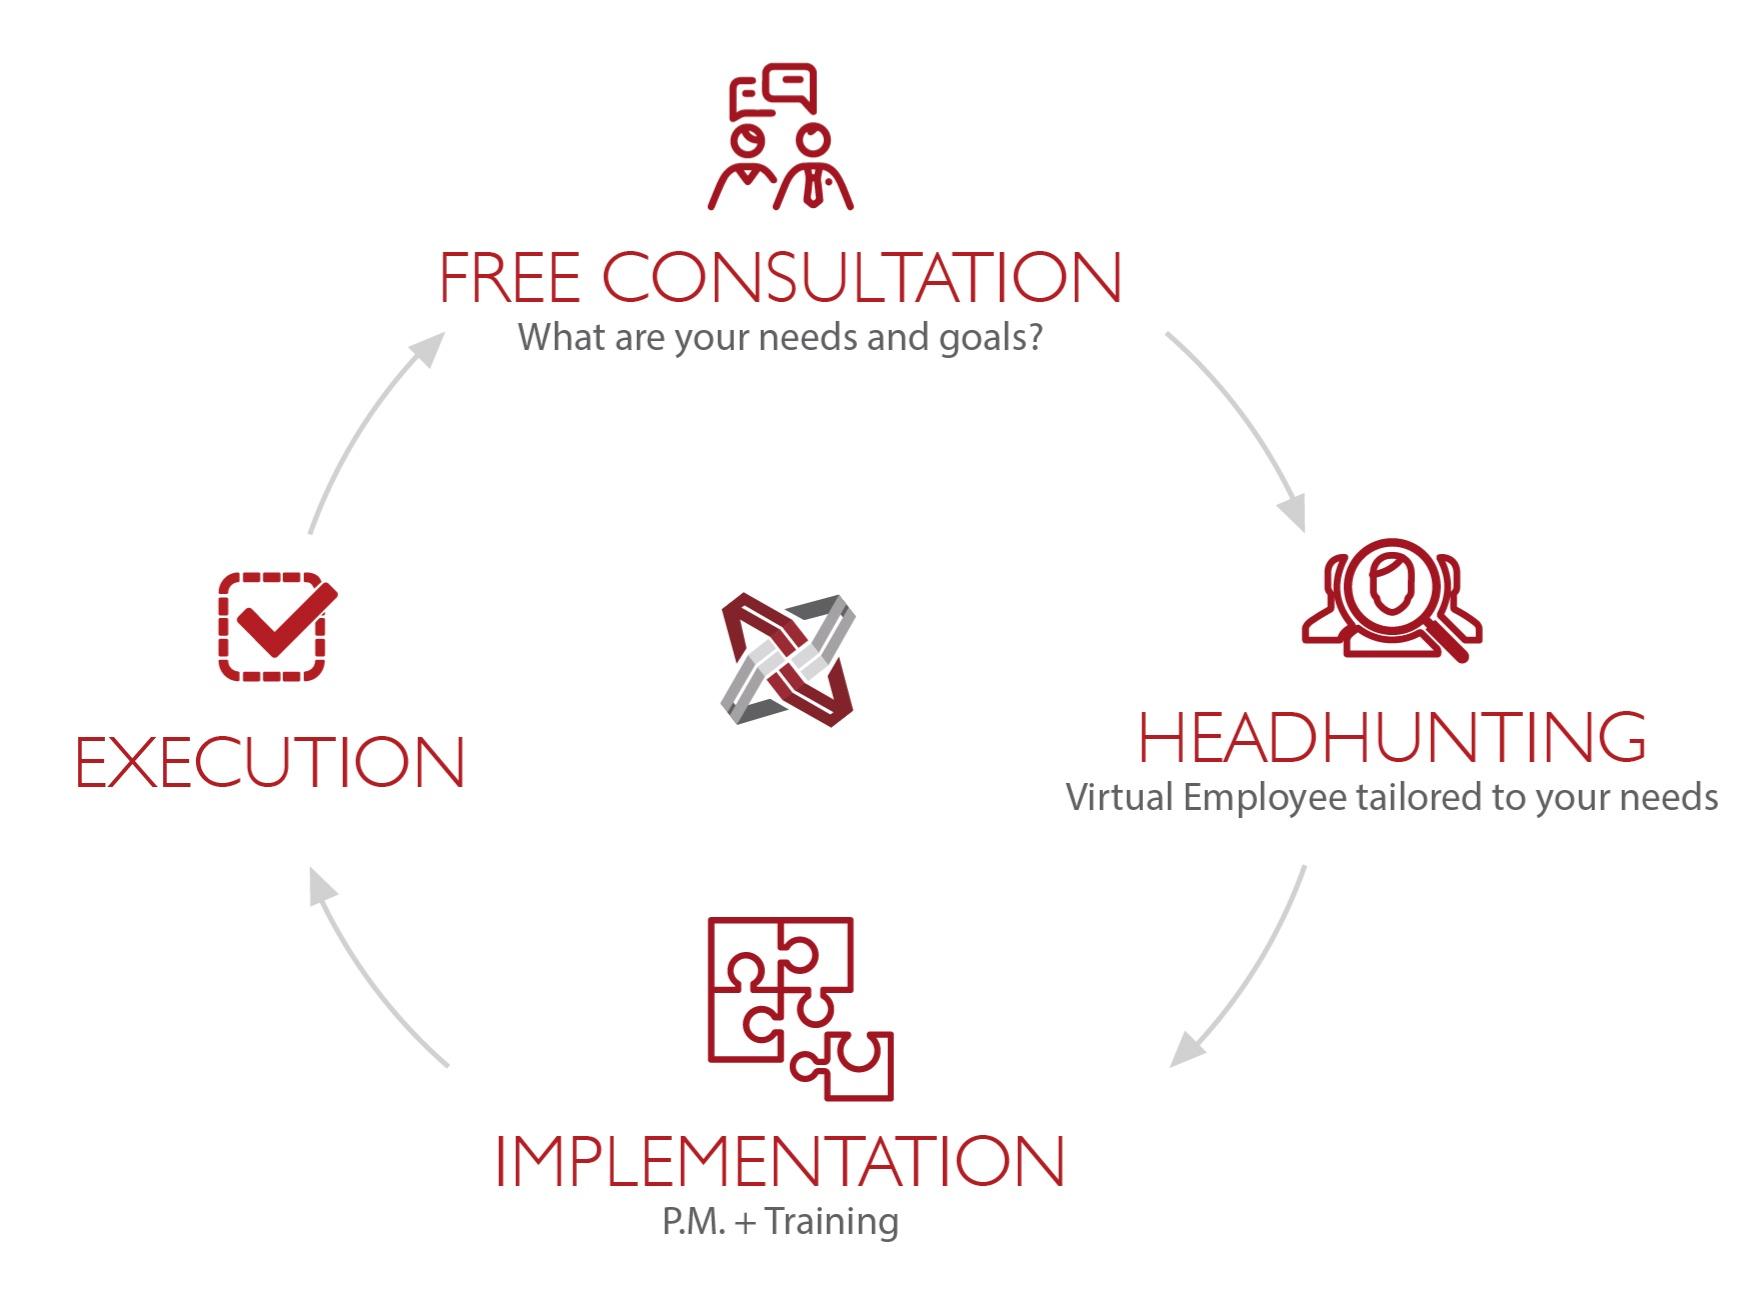 Diagrama-free-consultation.jpg